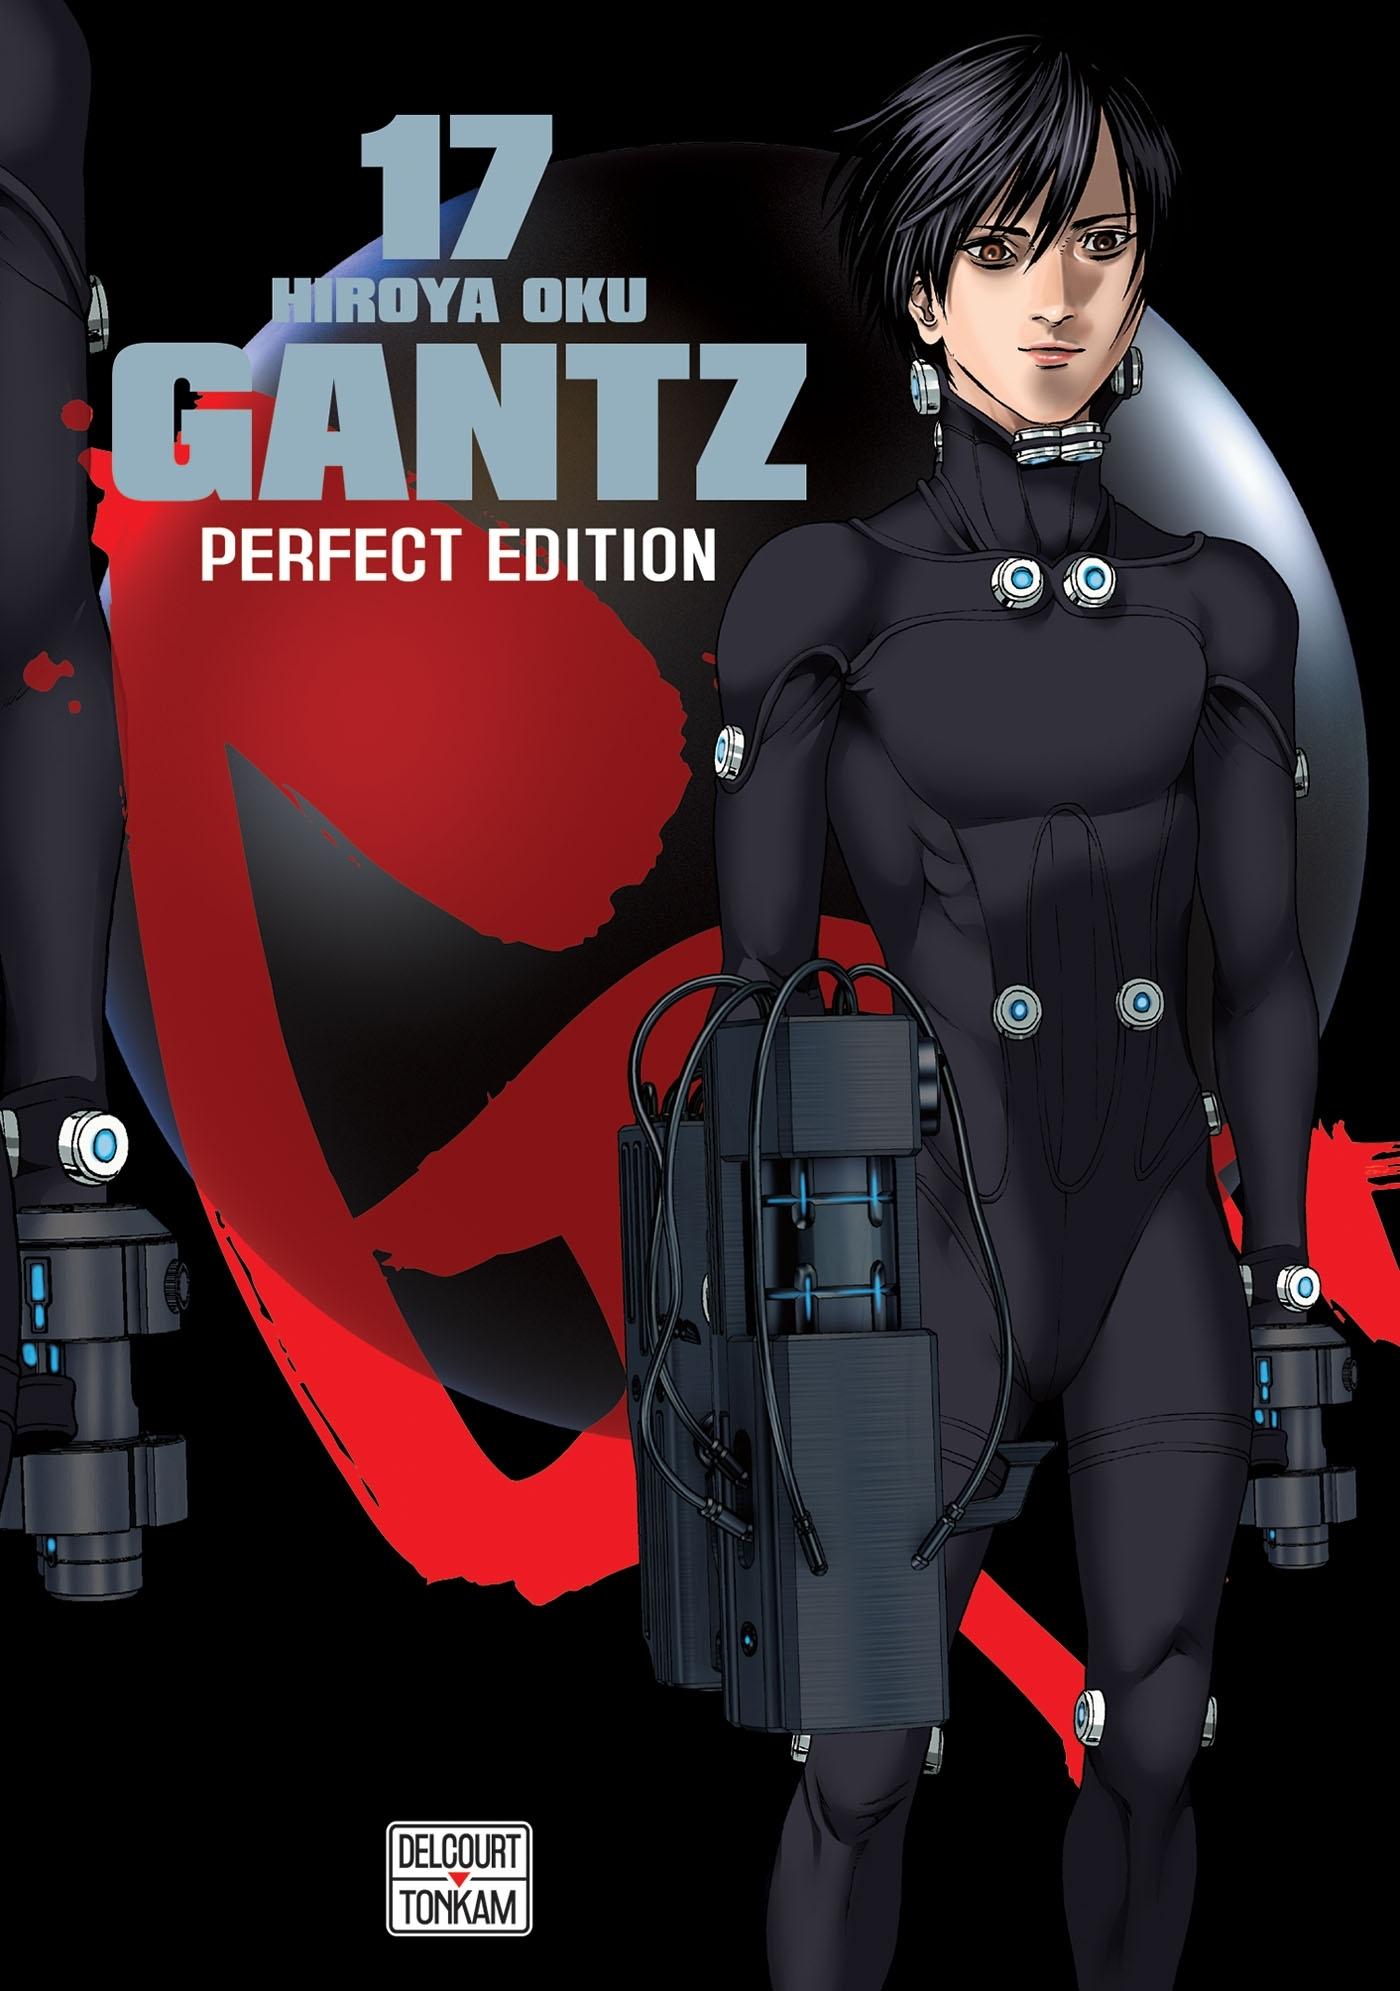 GANTZ PERFECT 17